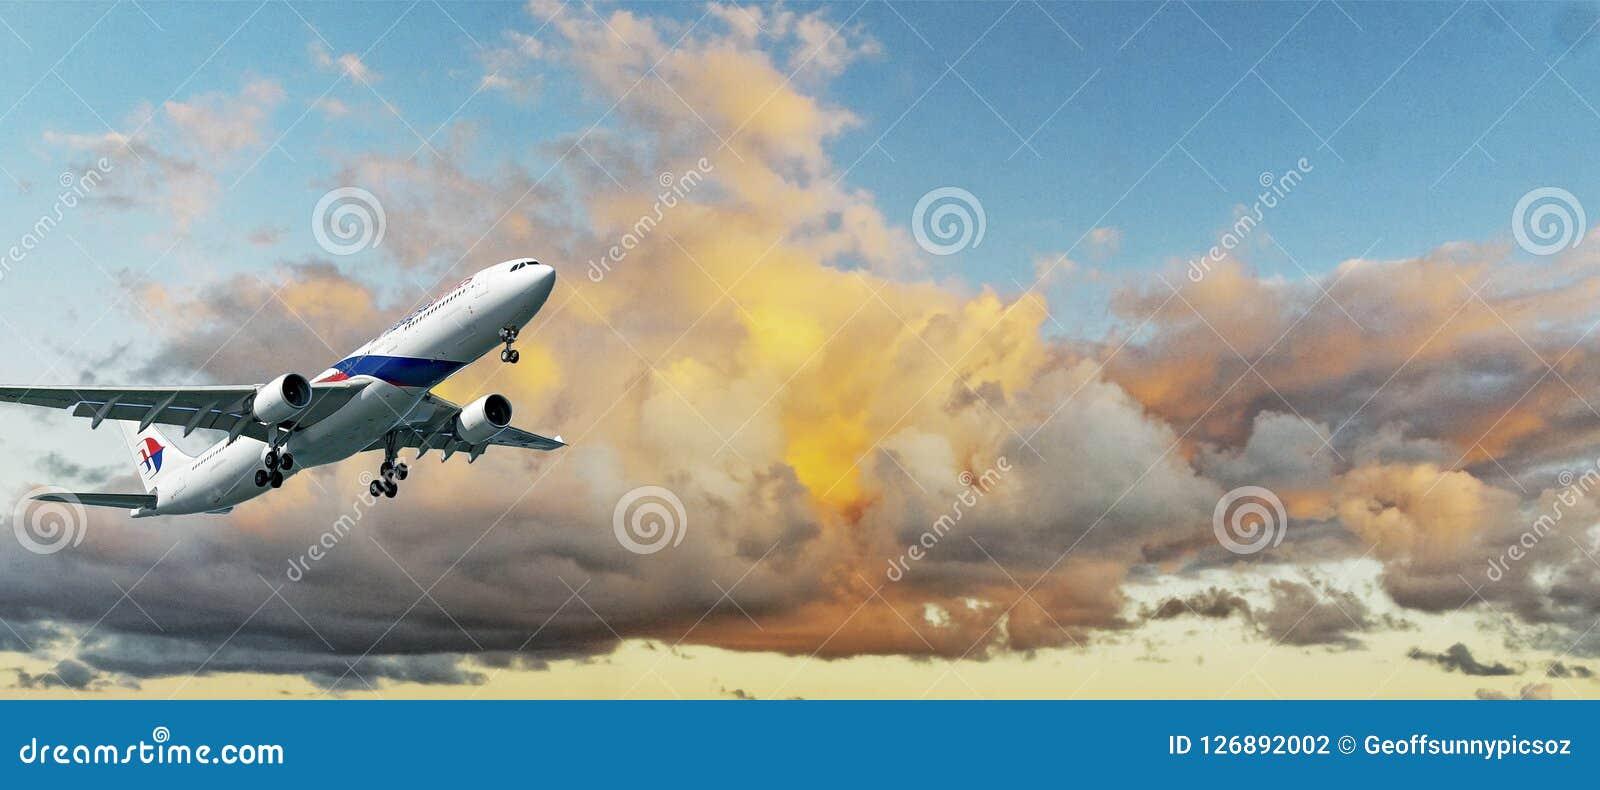 Aircraft in flight with Colourful cumulonimbus cloud in blue sky